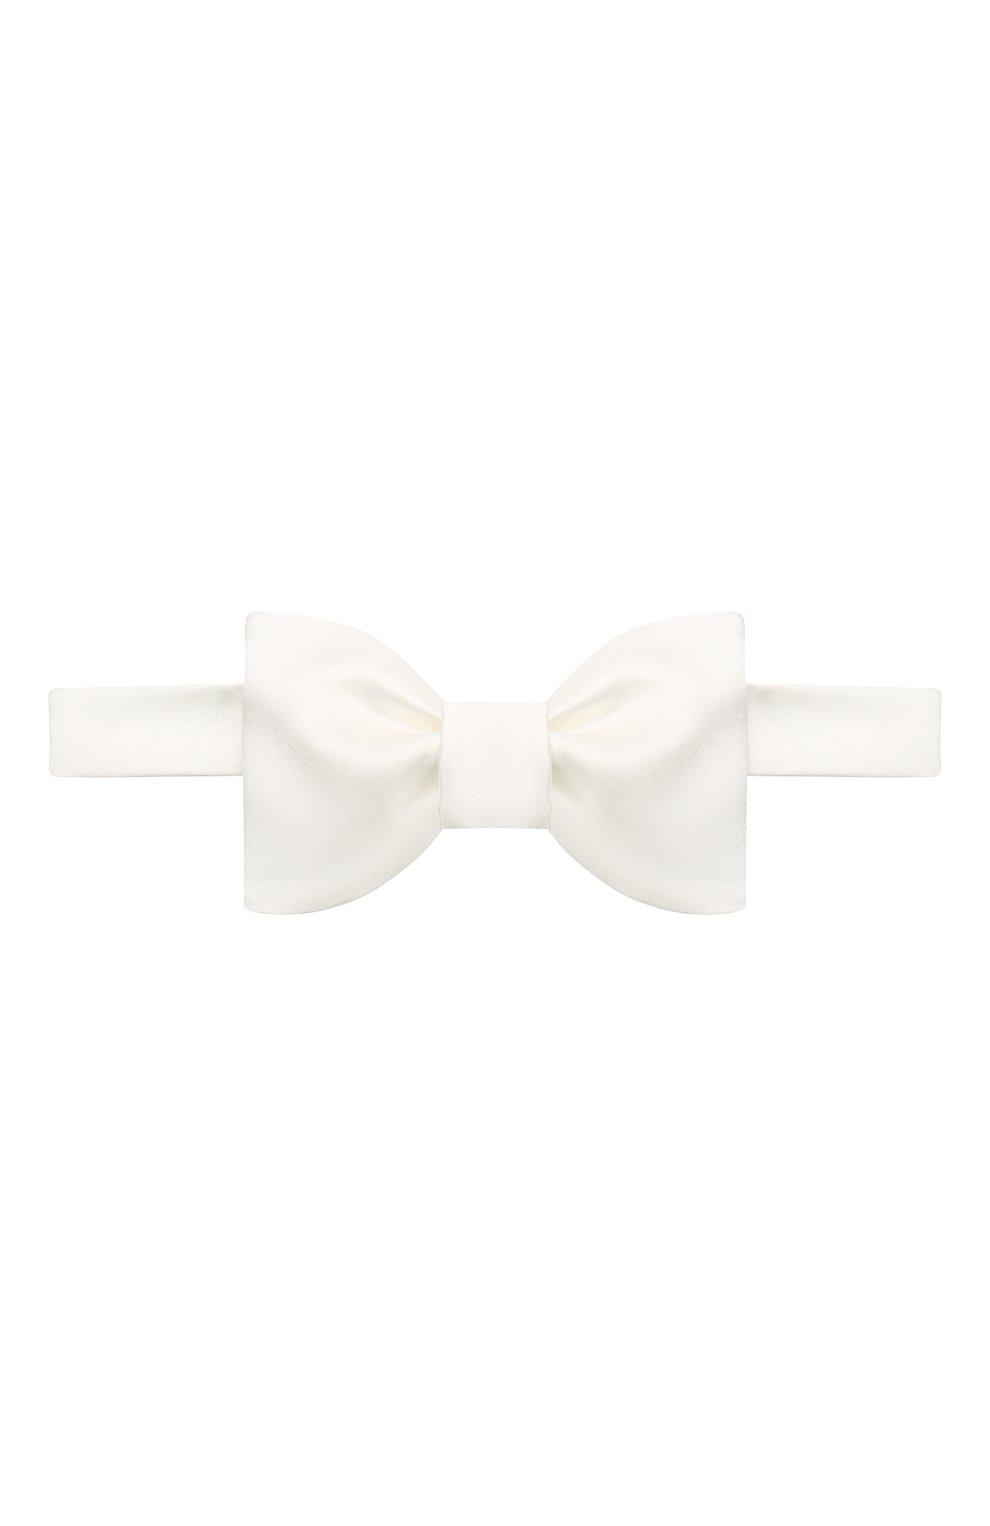 Мужской галстук-бабочка из хлопка и шелка BRUNELLO CUCINELLI белого цвета, арт. MR8130003 | Фото 1